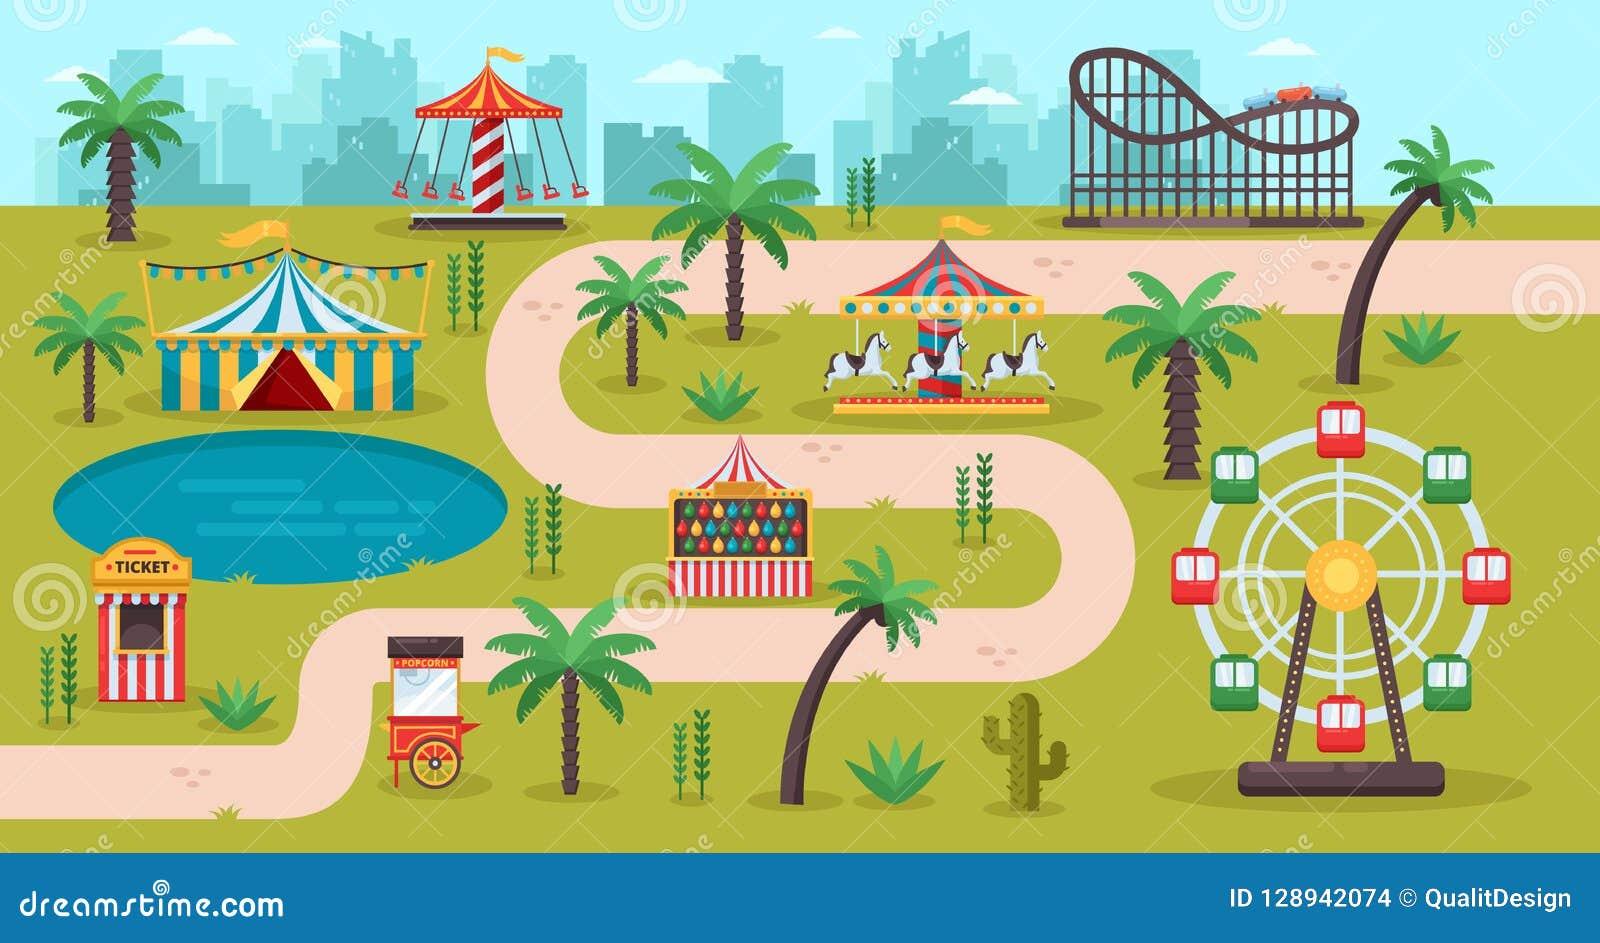 Amusement park map concept. Fun carousels, circus, ferris wheel, fair in family park, vector illustration.